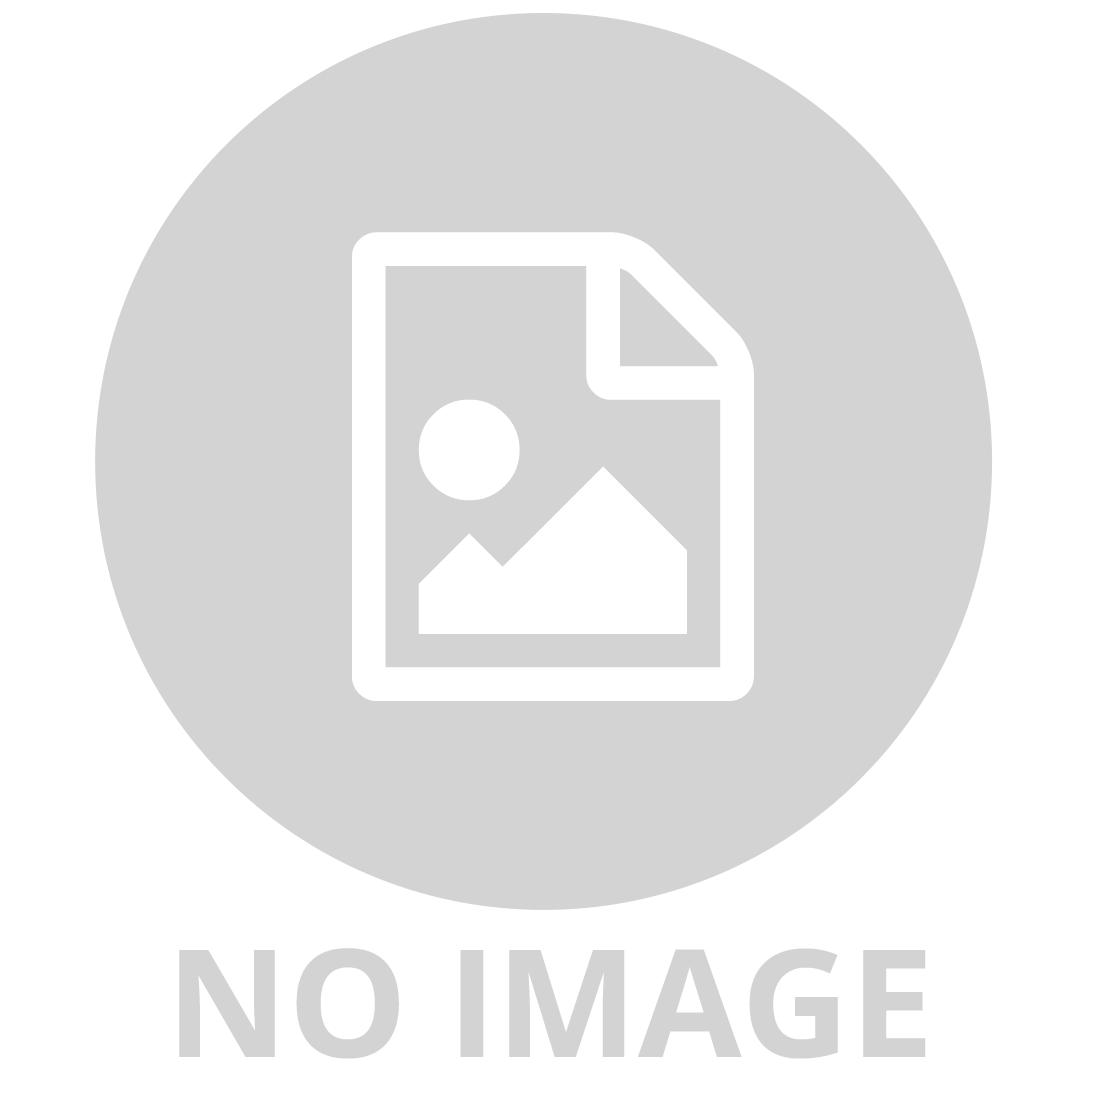 MUSIC BOX PINK BALLERINA